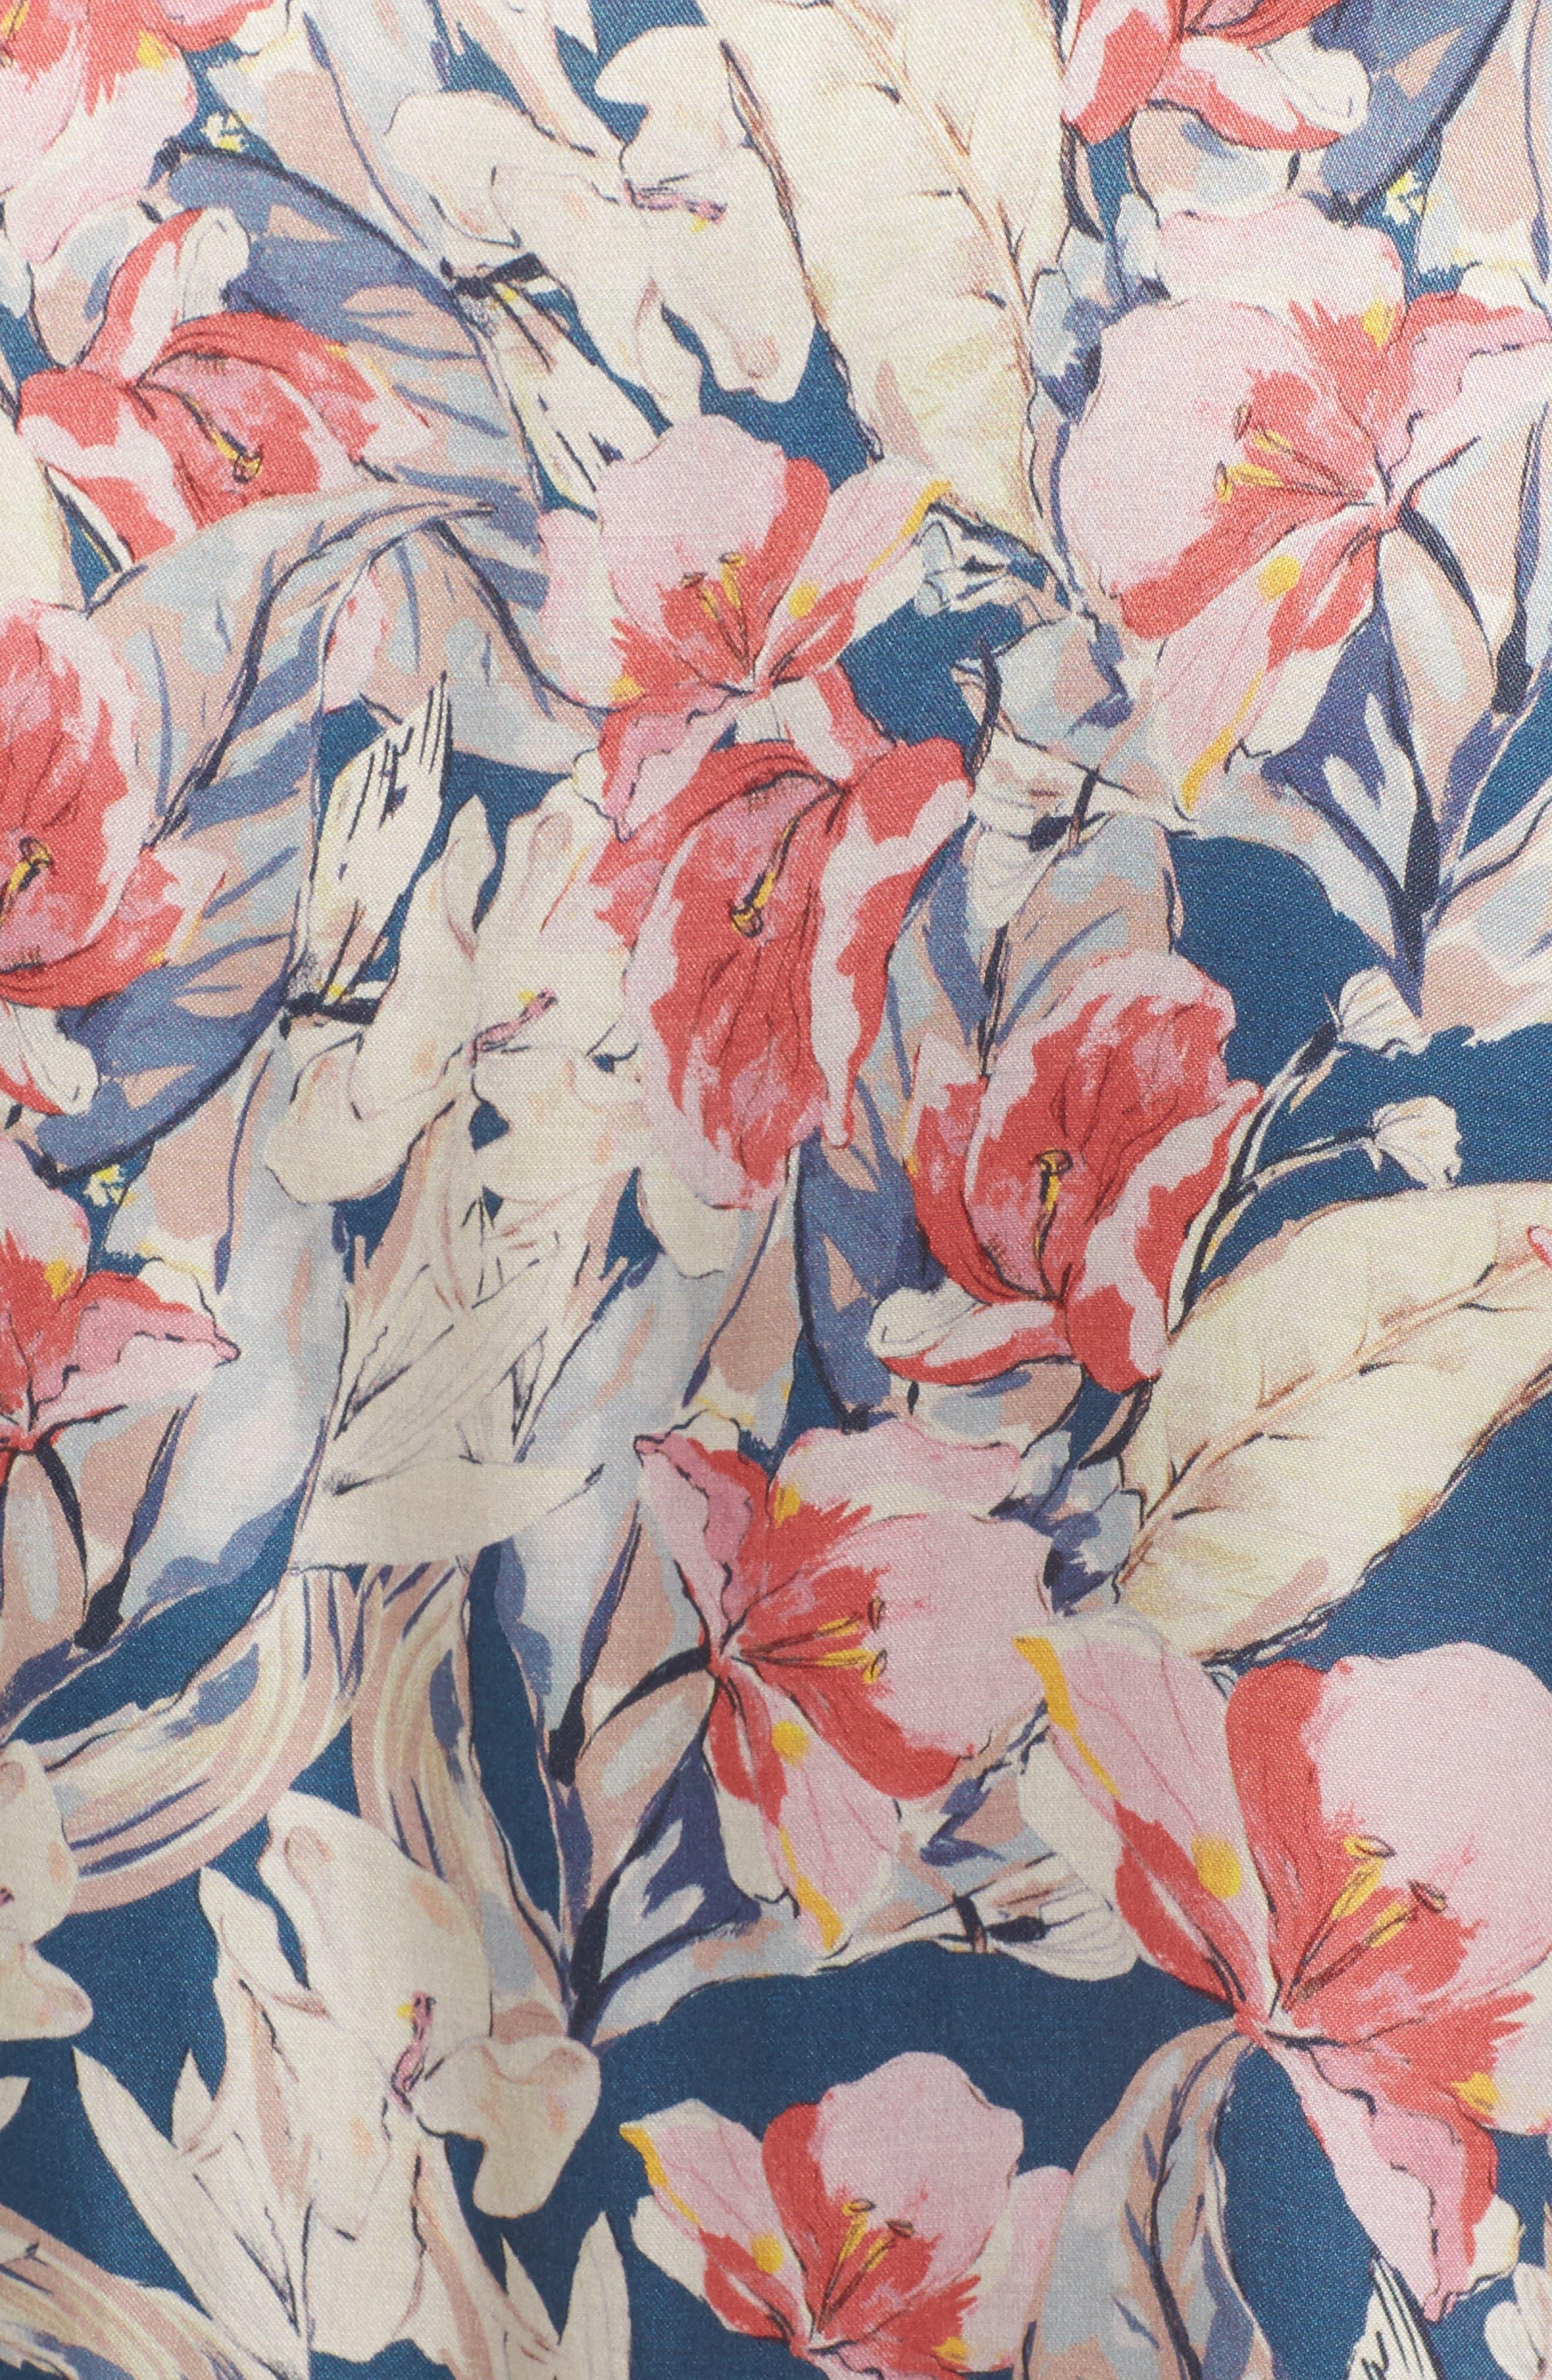 Lena Floral Print Top,                             Alternate thumbnail 5, color,                             Garden Floral